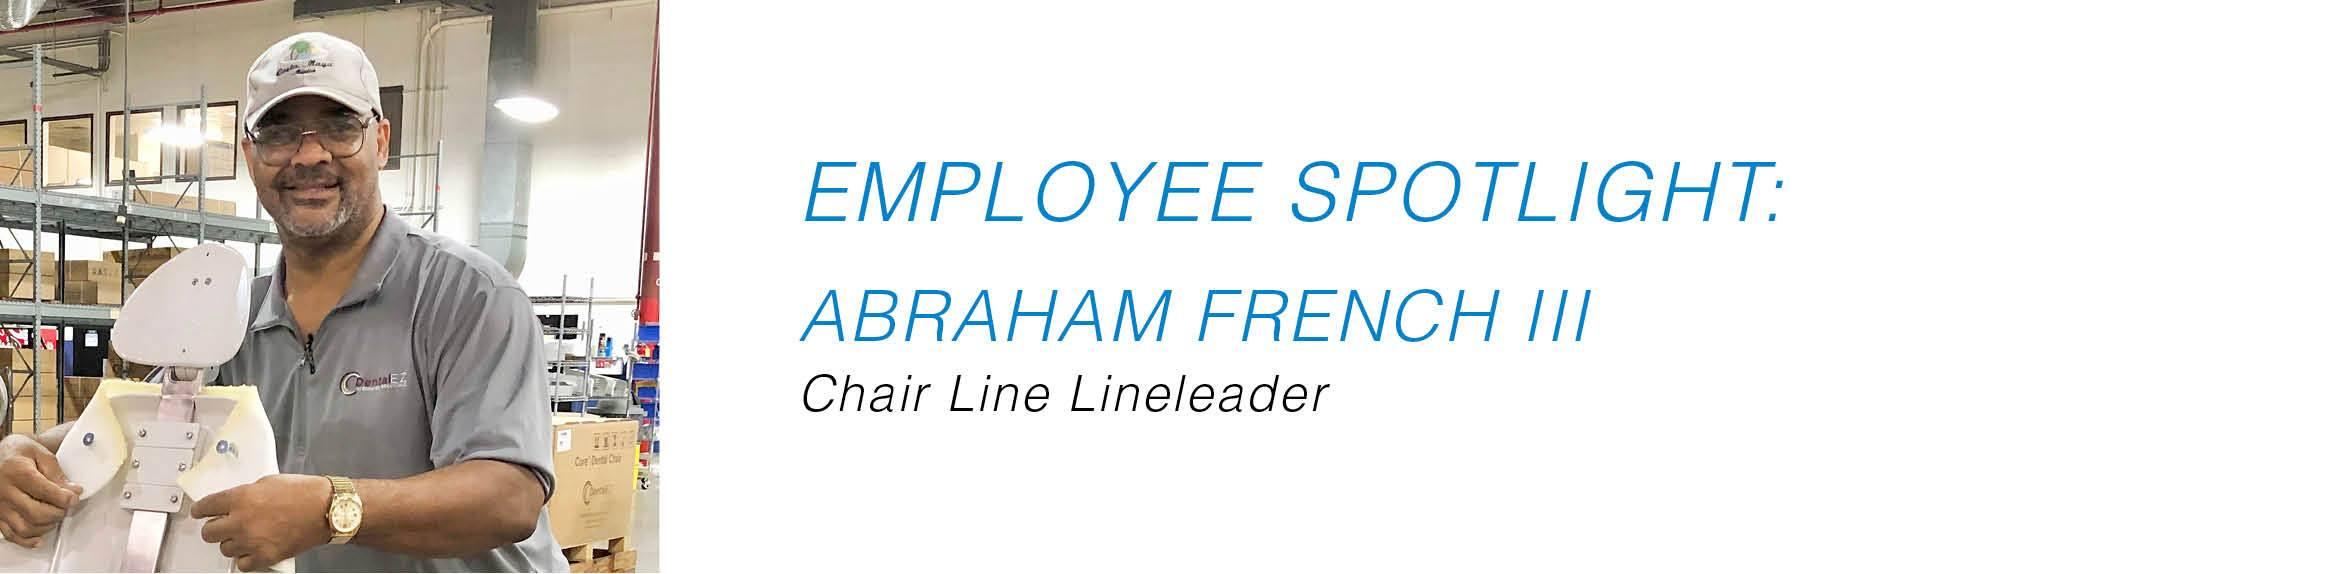 Employee Spotlight - Abraham French III